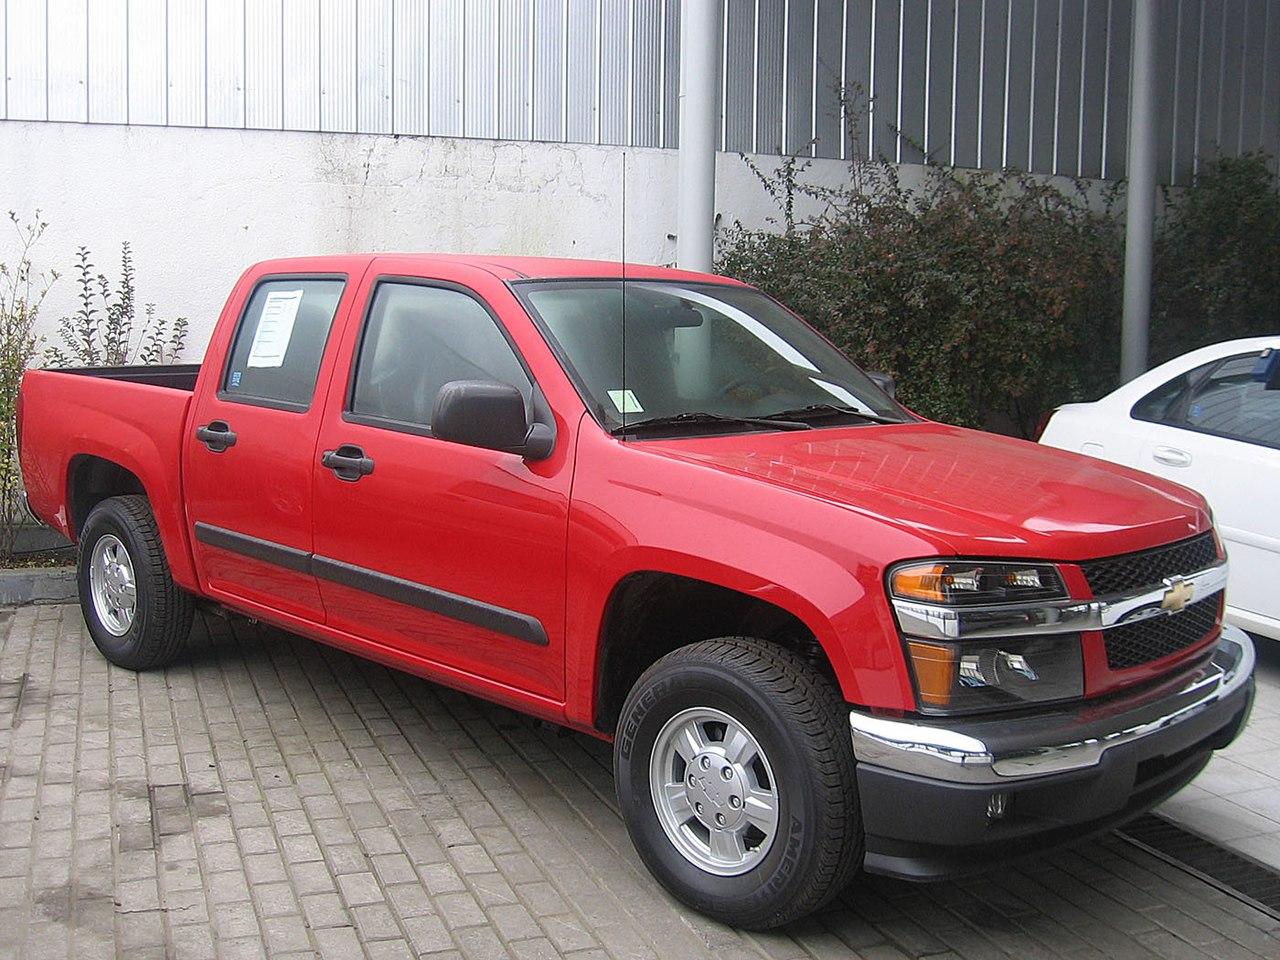 Image Result For Chevrolet Colorado